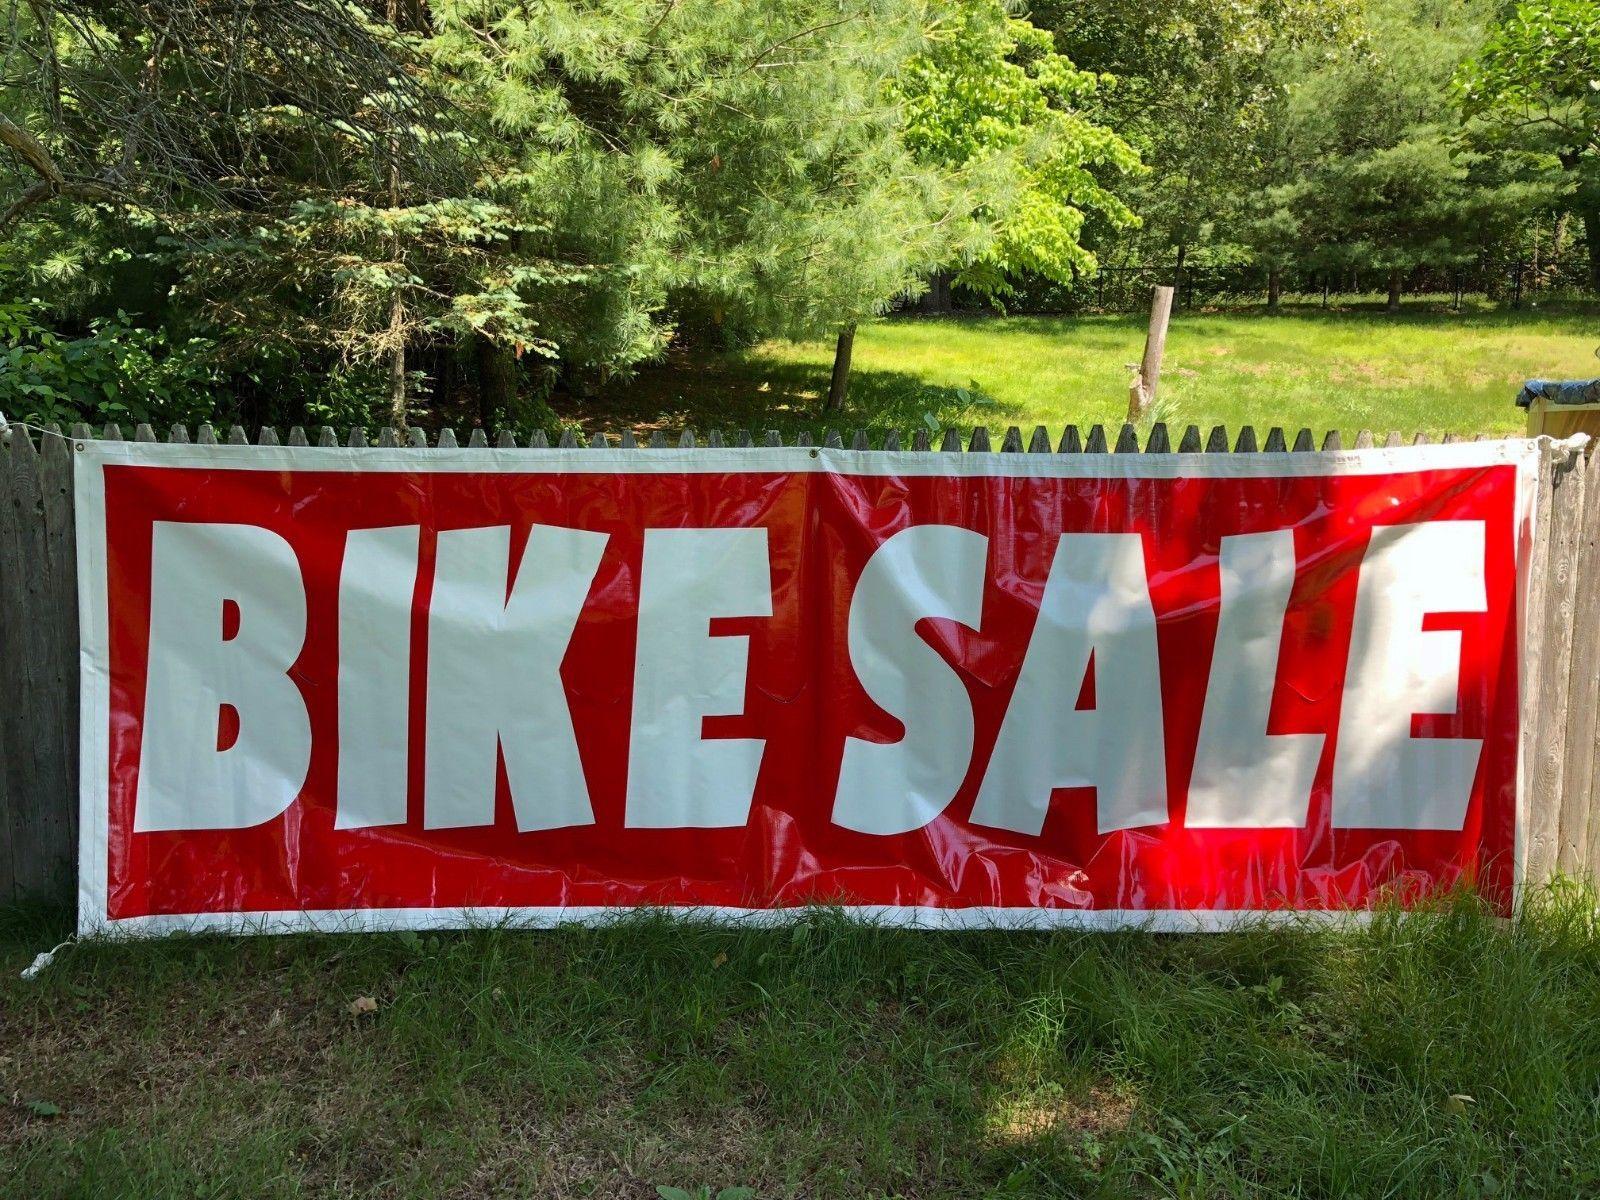 Bike Sale Sign Outdoor Advertising Vinyl Banner Folded Stitched